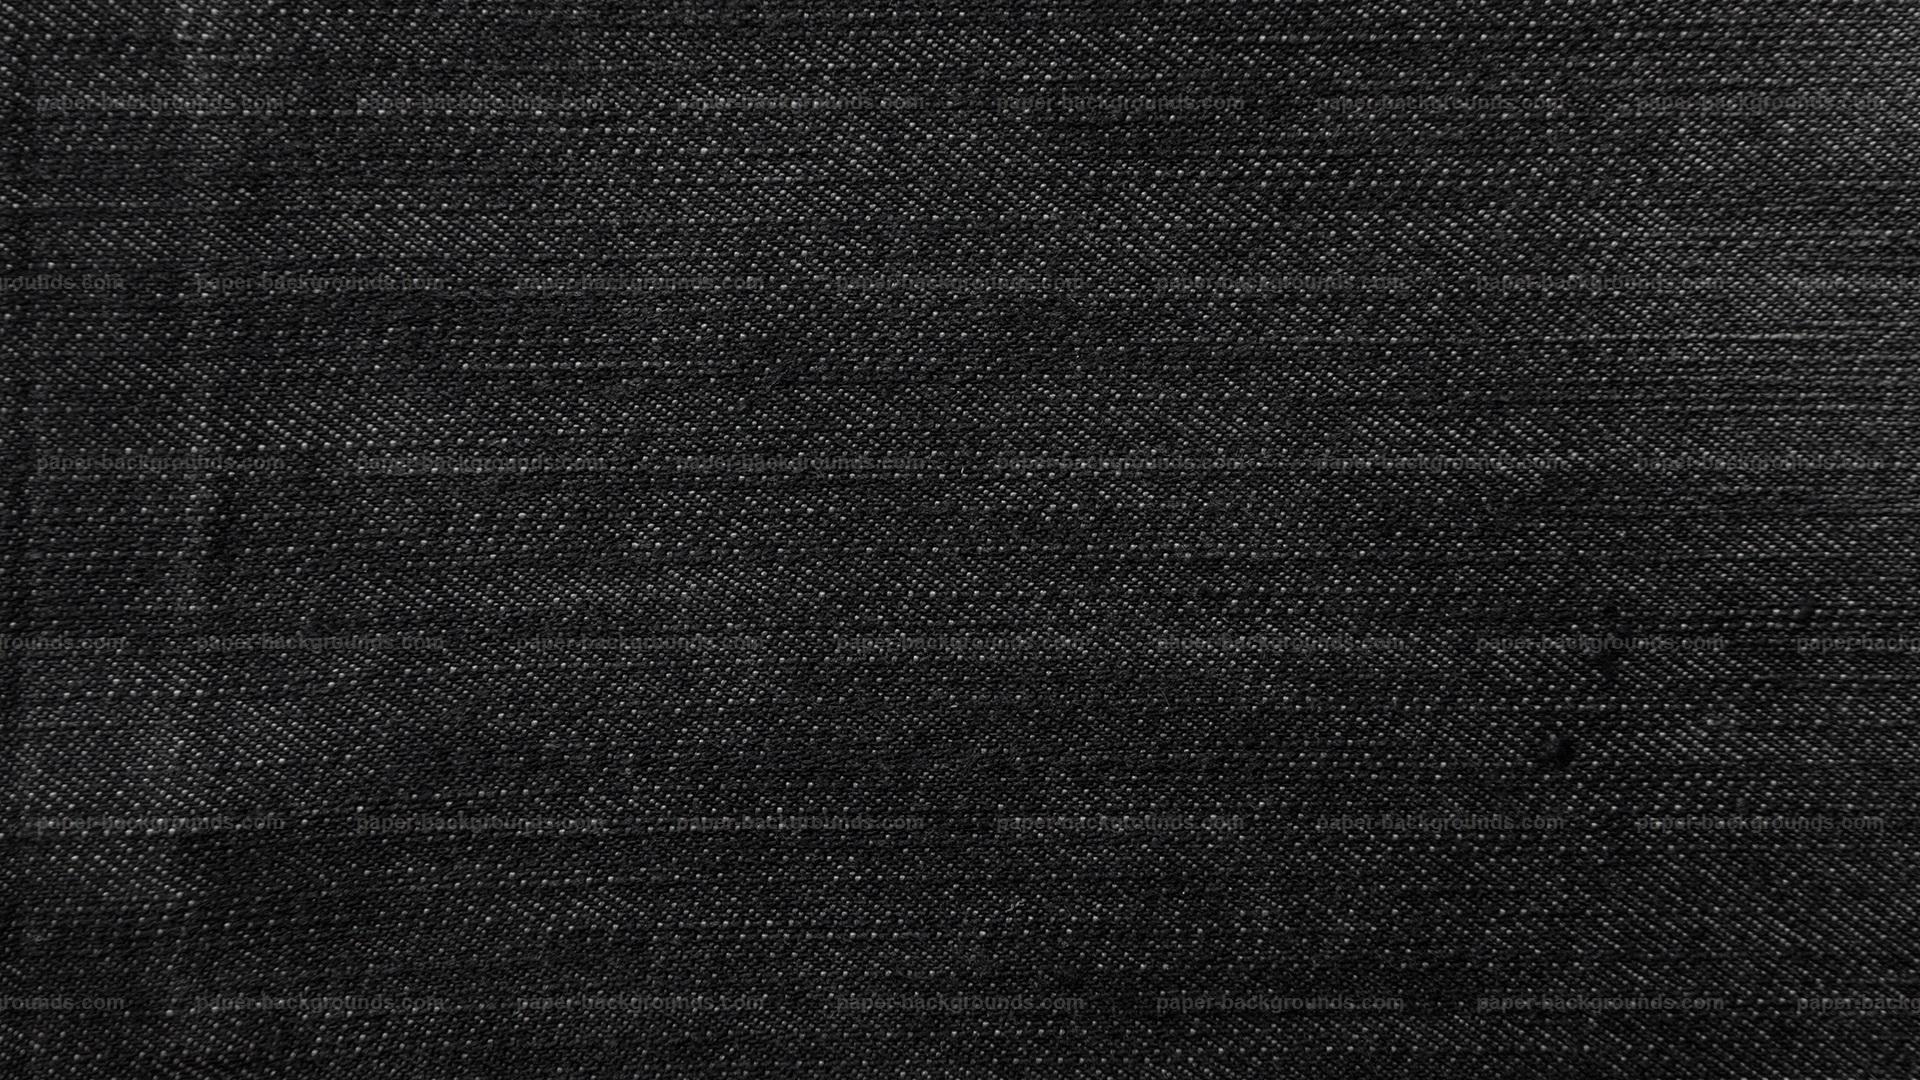 [47+] Black Wallpaper Texture on WallpaperSafari